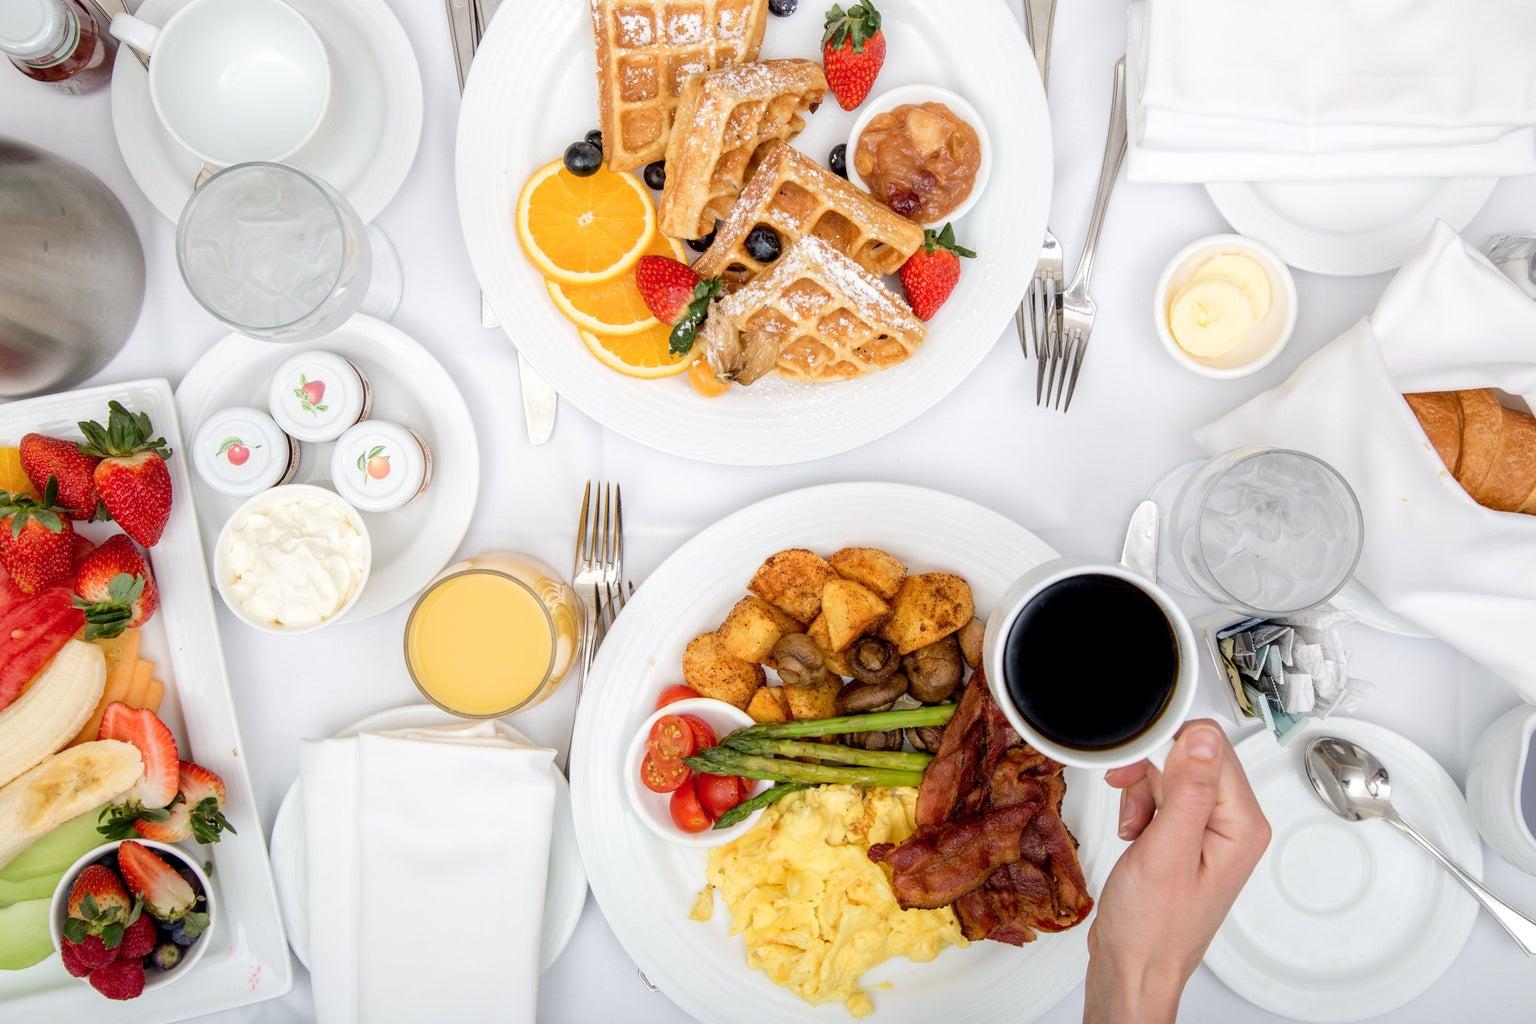 Hotel breakfast room service